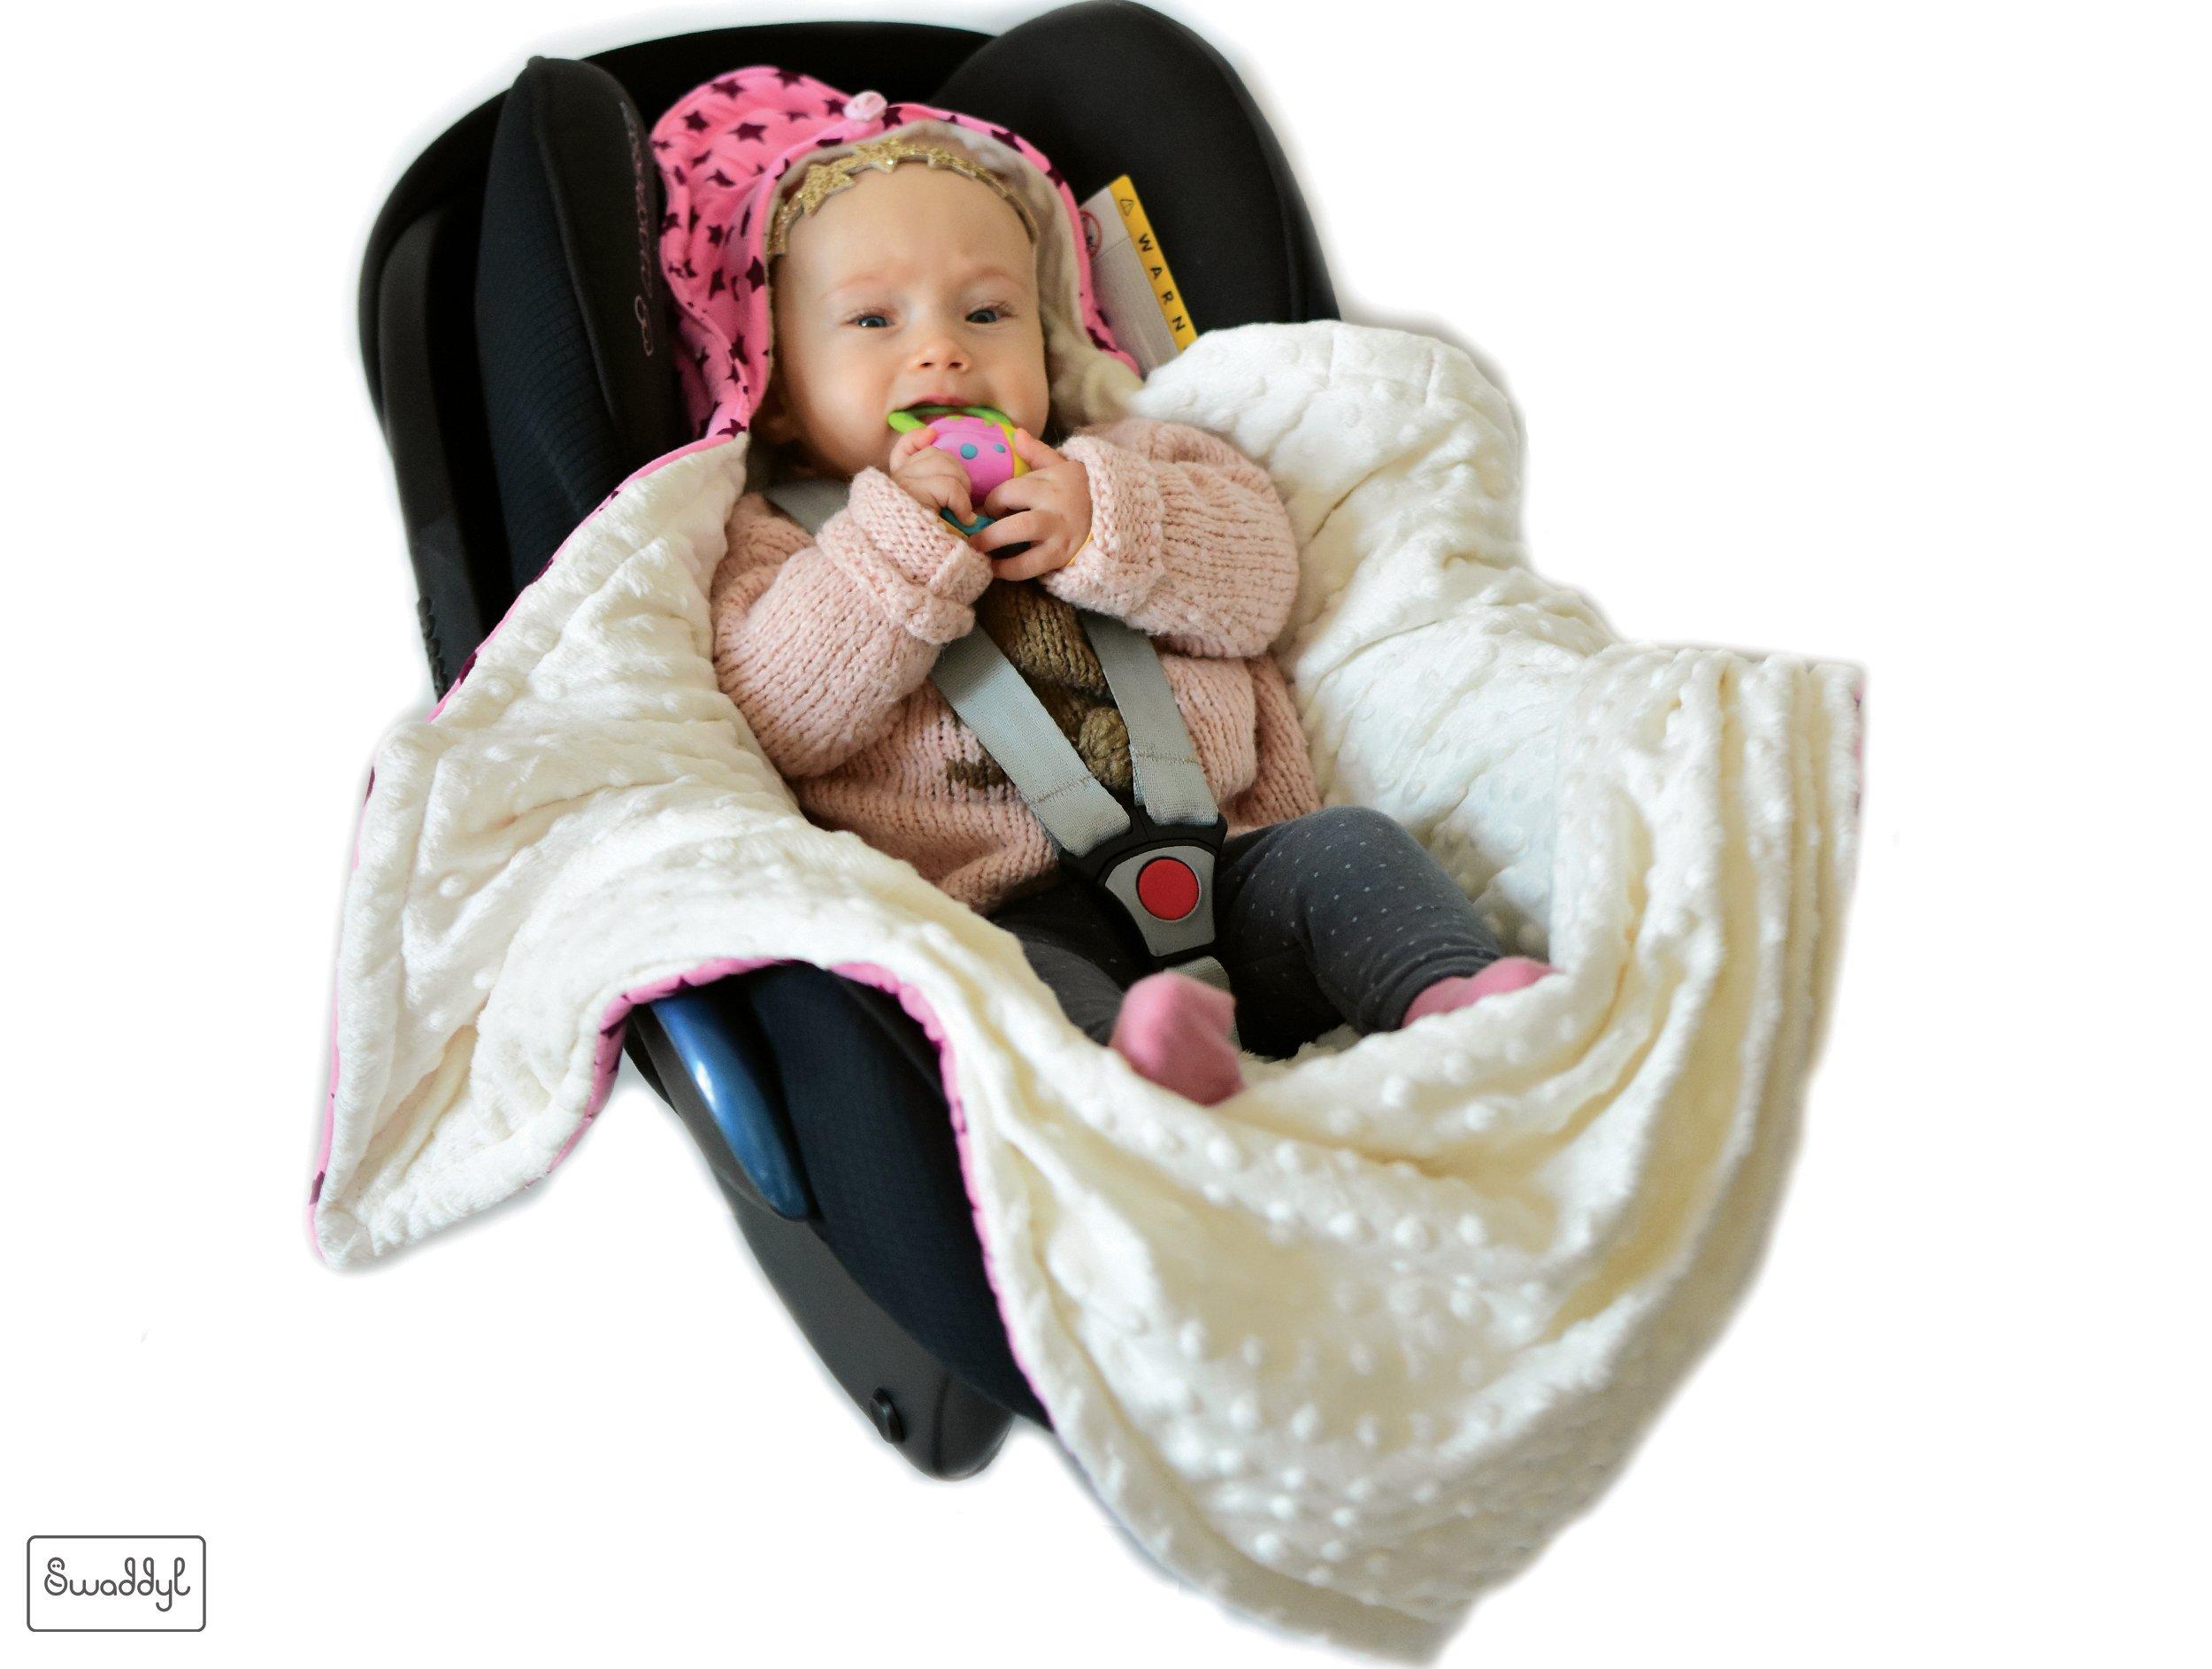 SWADDYL Baby girl swaddle blanket I car seat I stroller I hooded I bunting I newborn I Minky plush and cotton I Made in Europe (RoseHeart) by Swaddyl (Image #3)